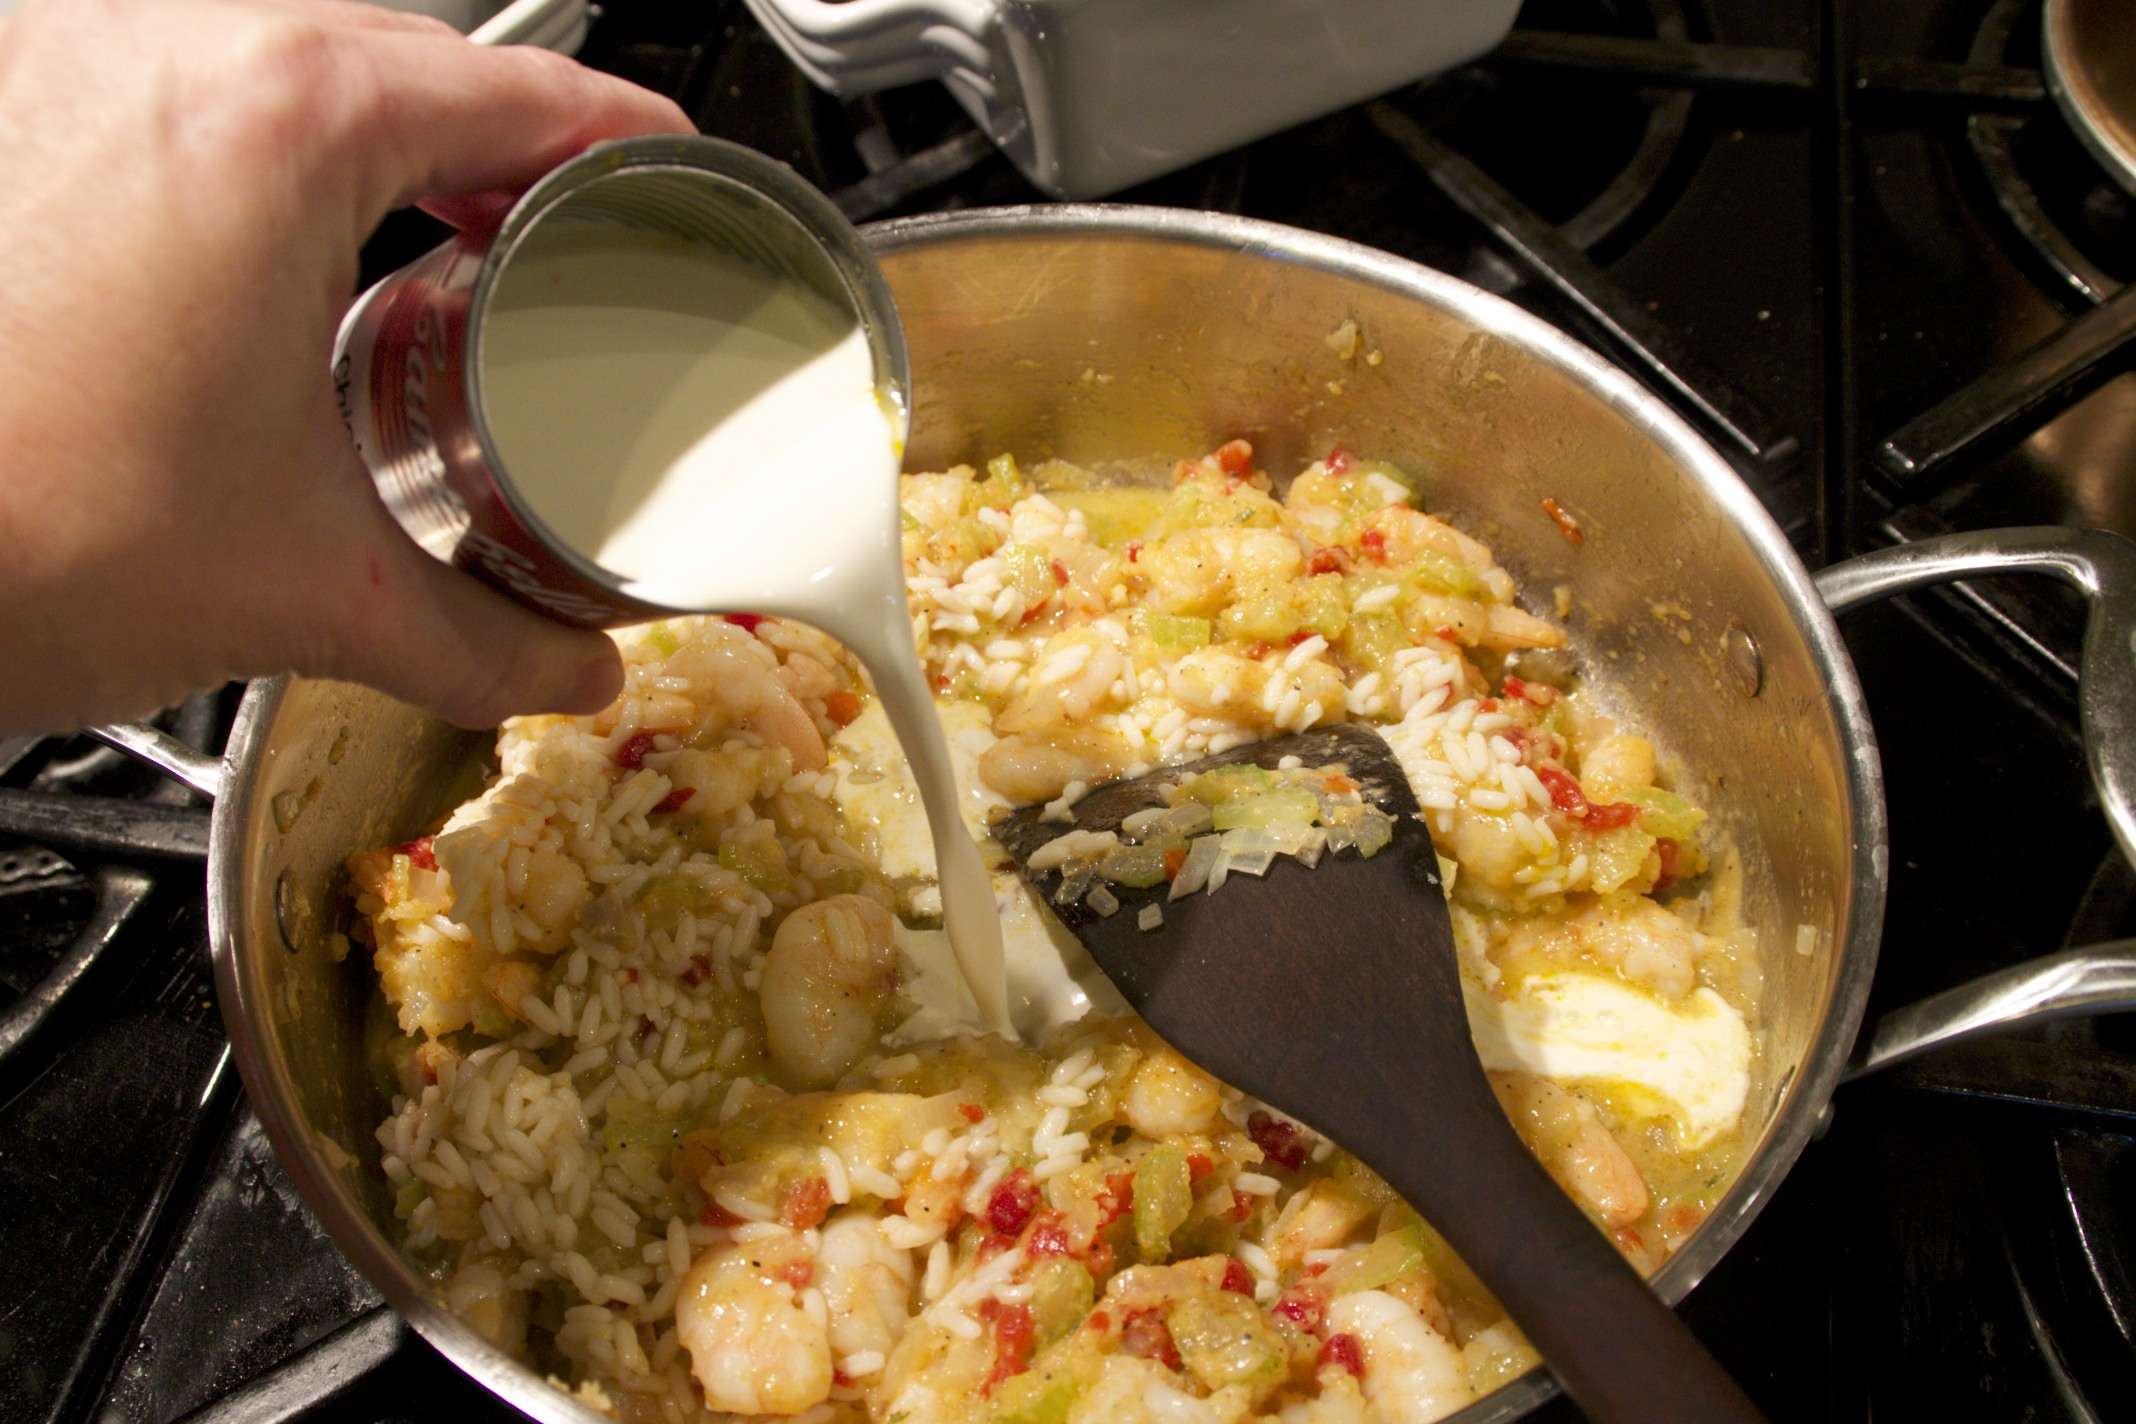 wild rice and shrimp casserole